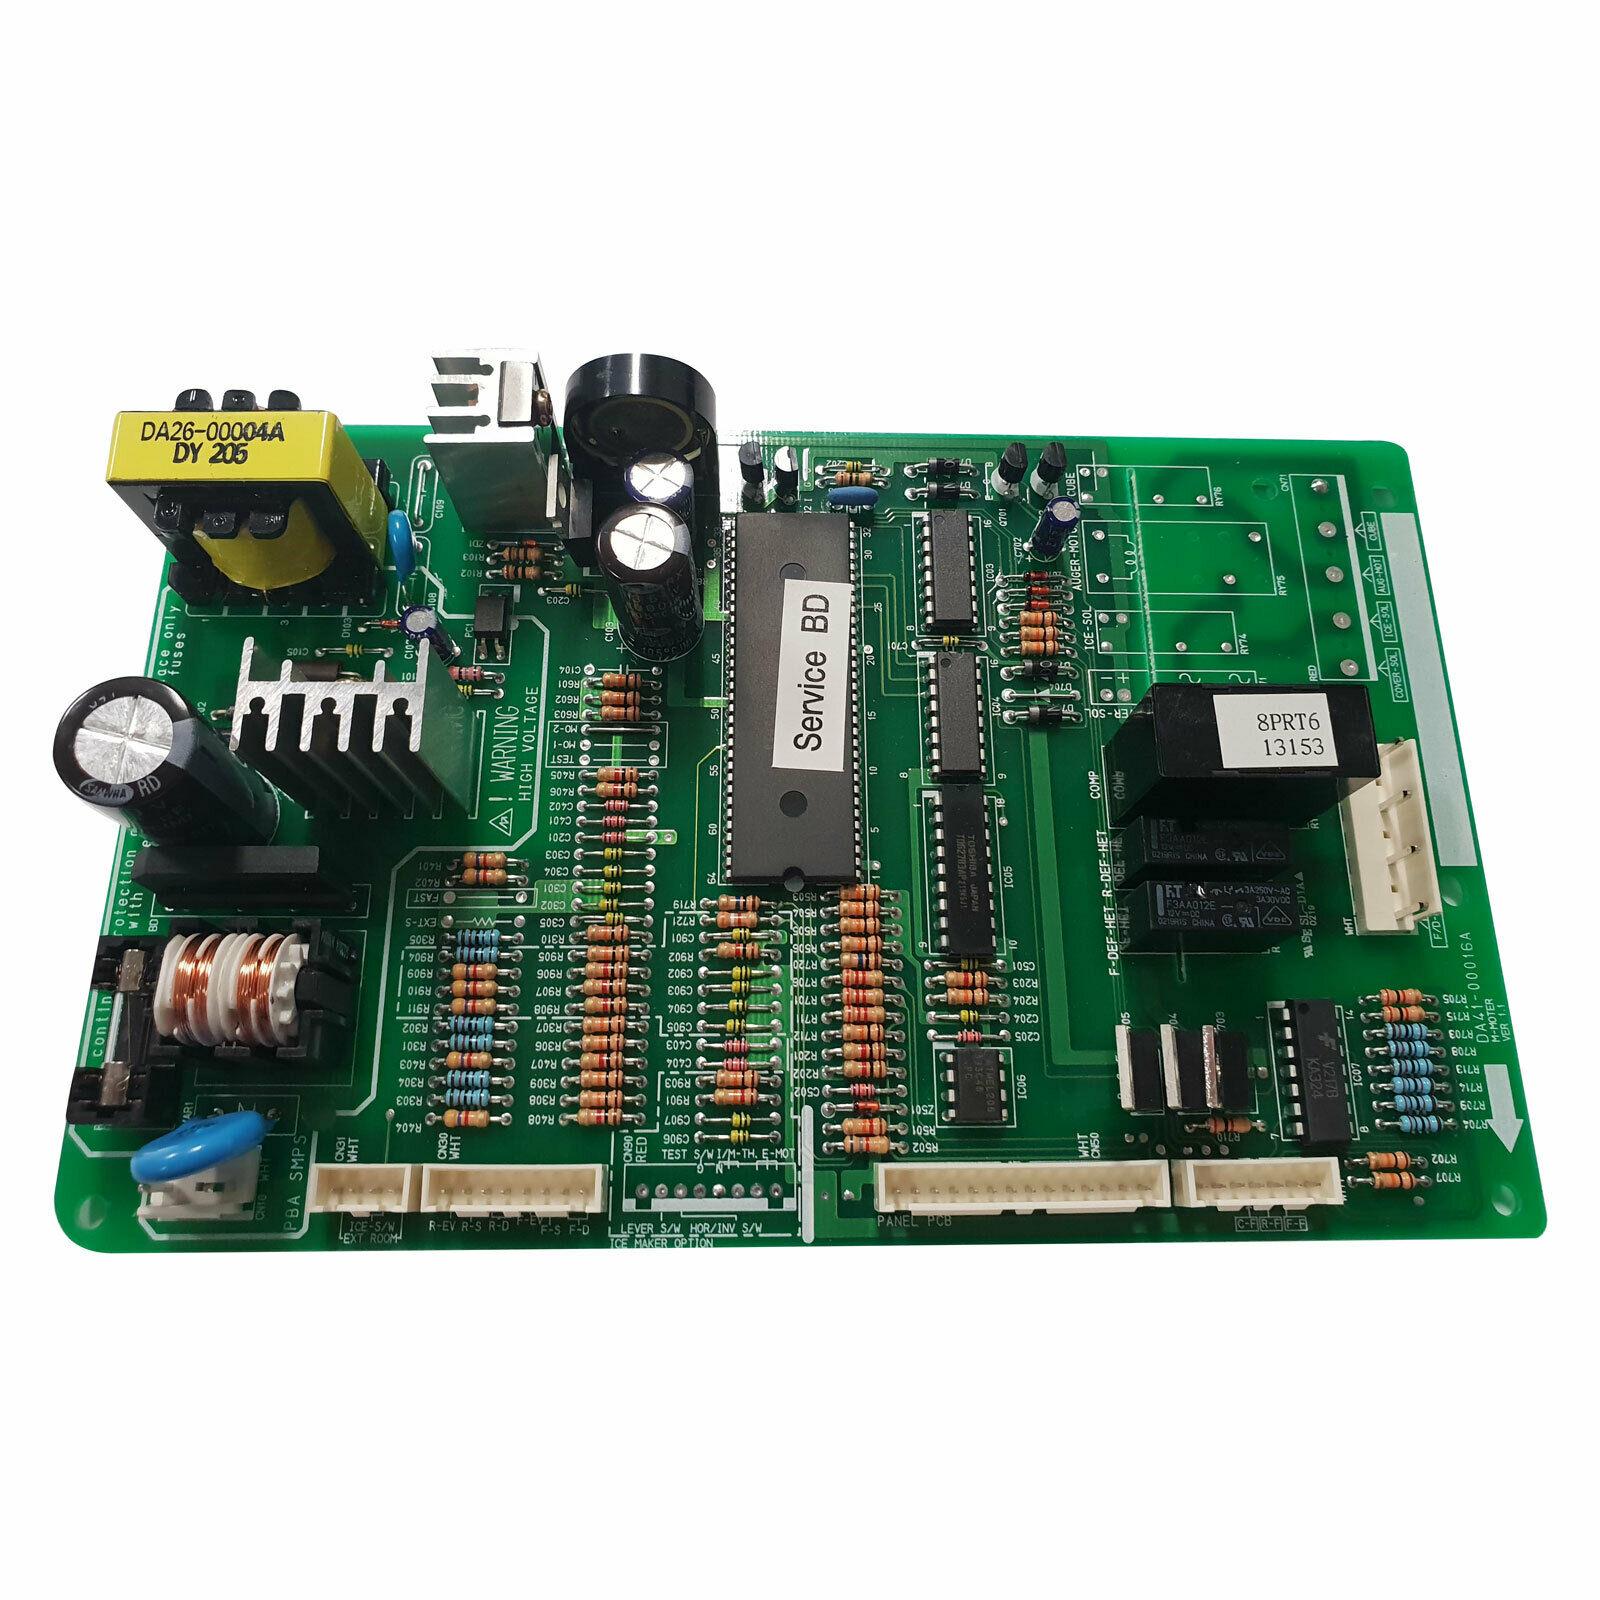 Samsung Fridge Freezer Main Control Board DA41-00024C SRS579NP SRS588BDW